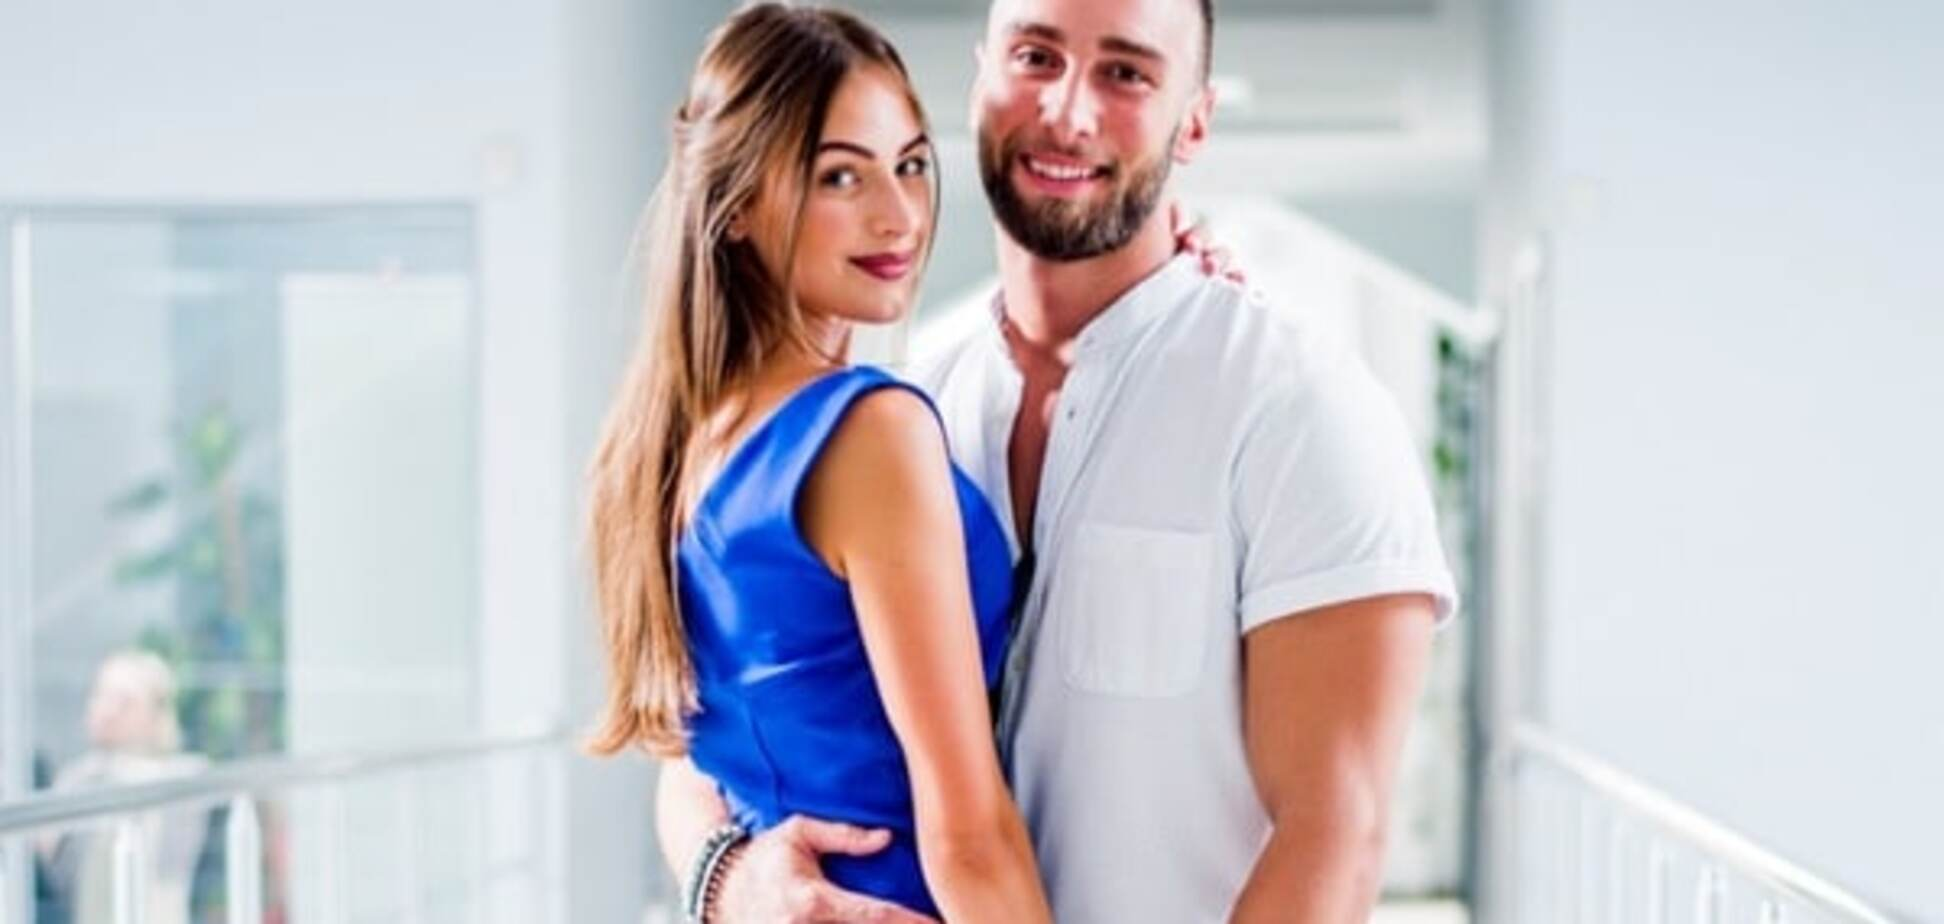 Алена Лесик и Иракли Макацария